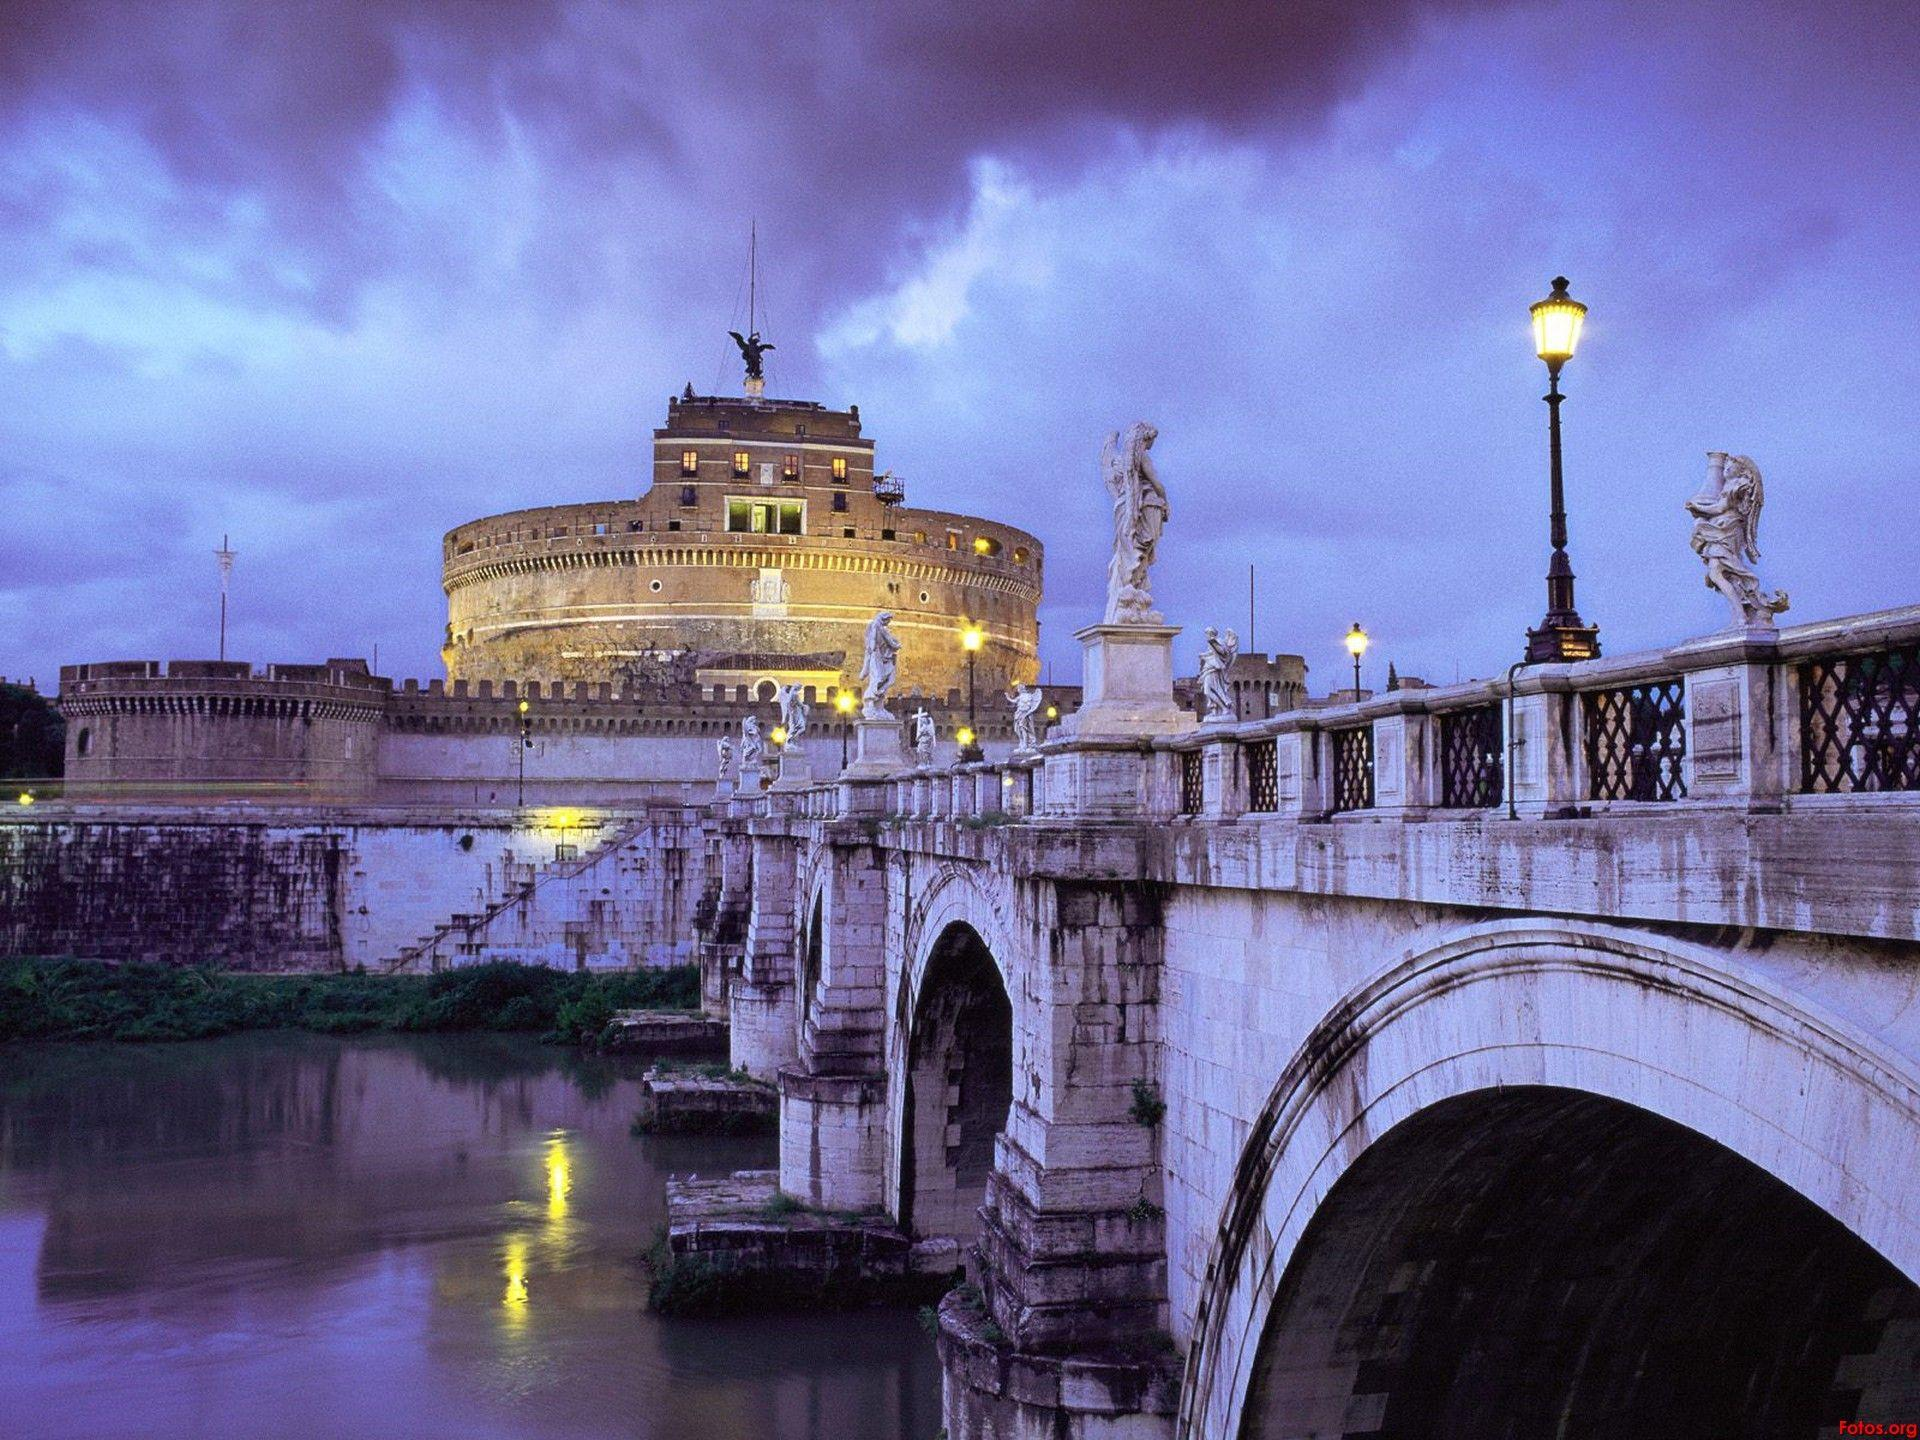 Fonds d'écran Roma : tous les wallpapers Roma